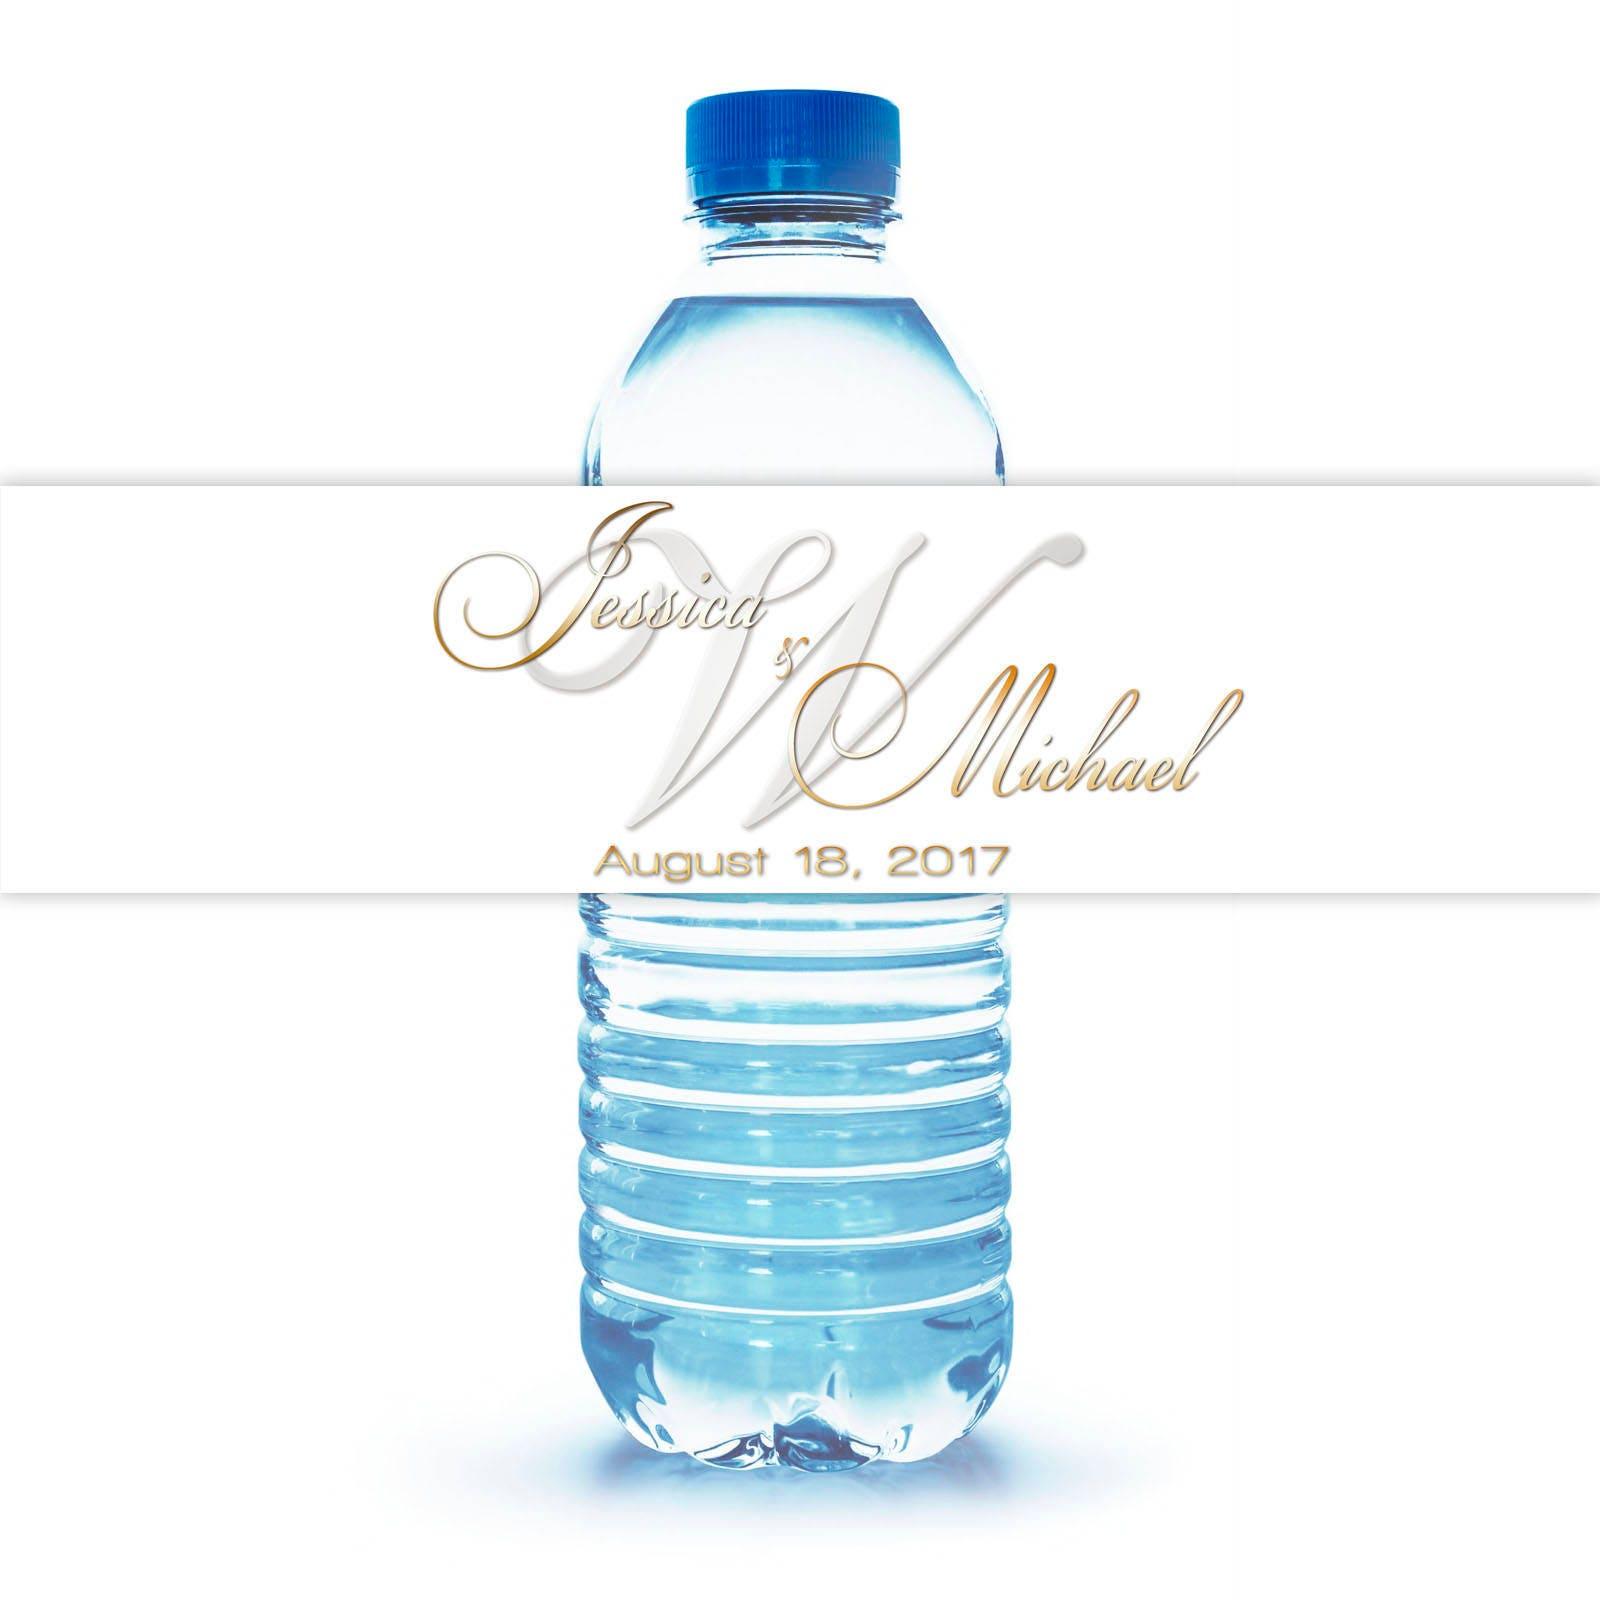 Custom Designed Water Bottle Labels // SAME DAY PROCESSING